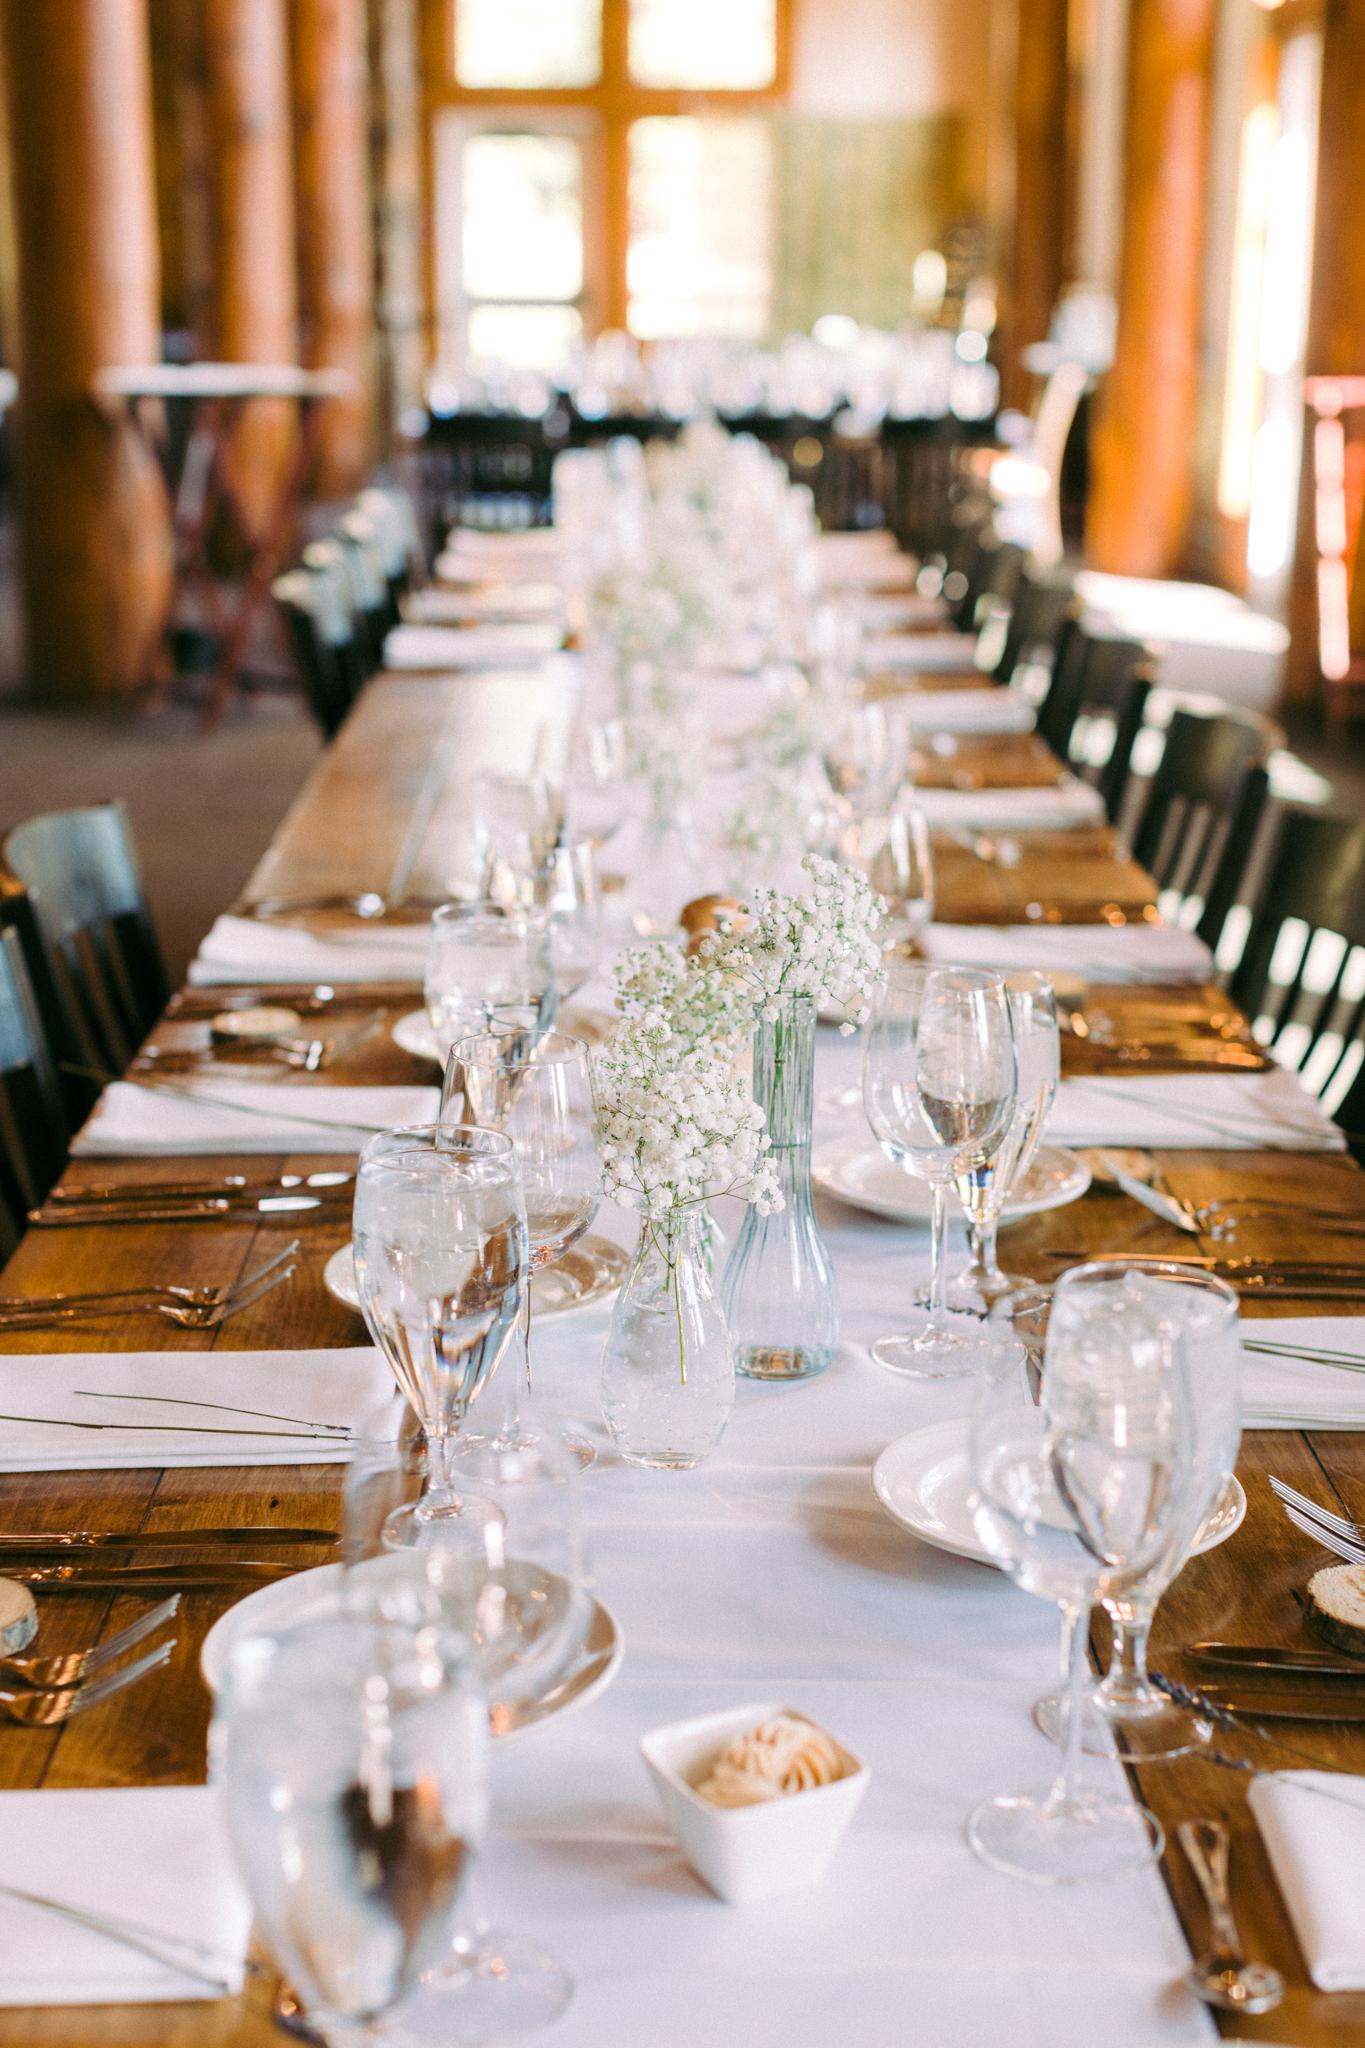 Timber Ridge Lodge Keystone Colorado Summer Wedding Table Setting